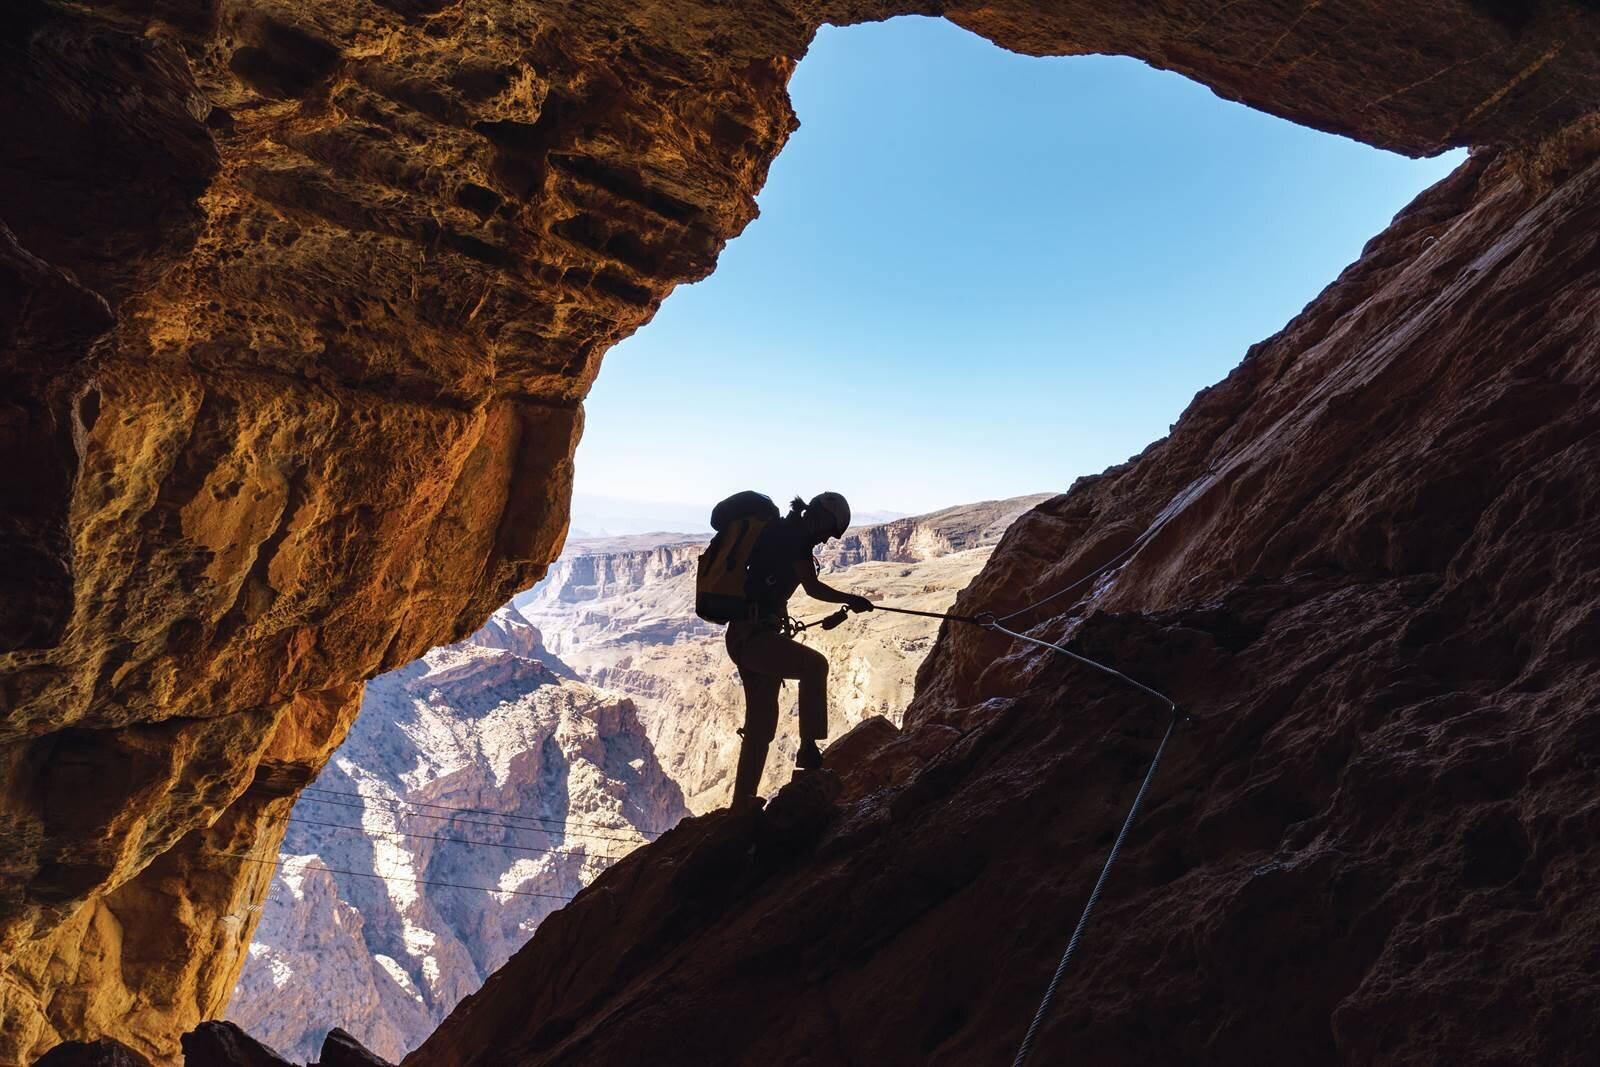 - The Alila Experience's Cave Adventure Via Ferrata in Oman is for the adventurous